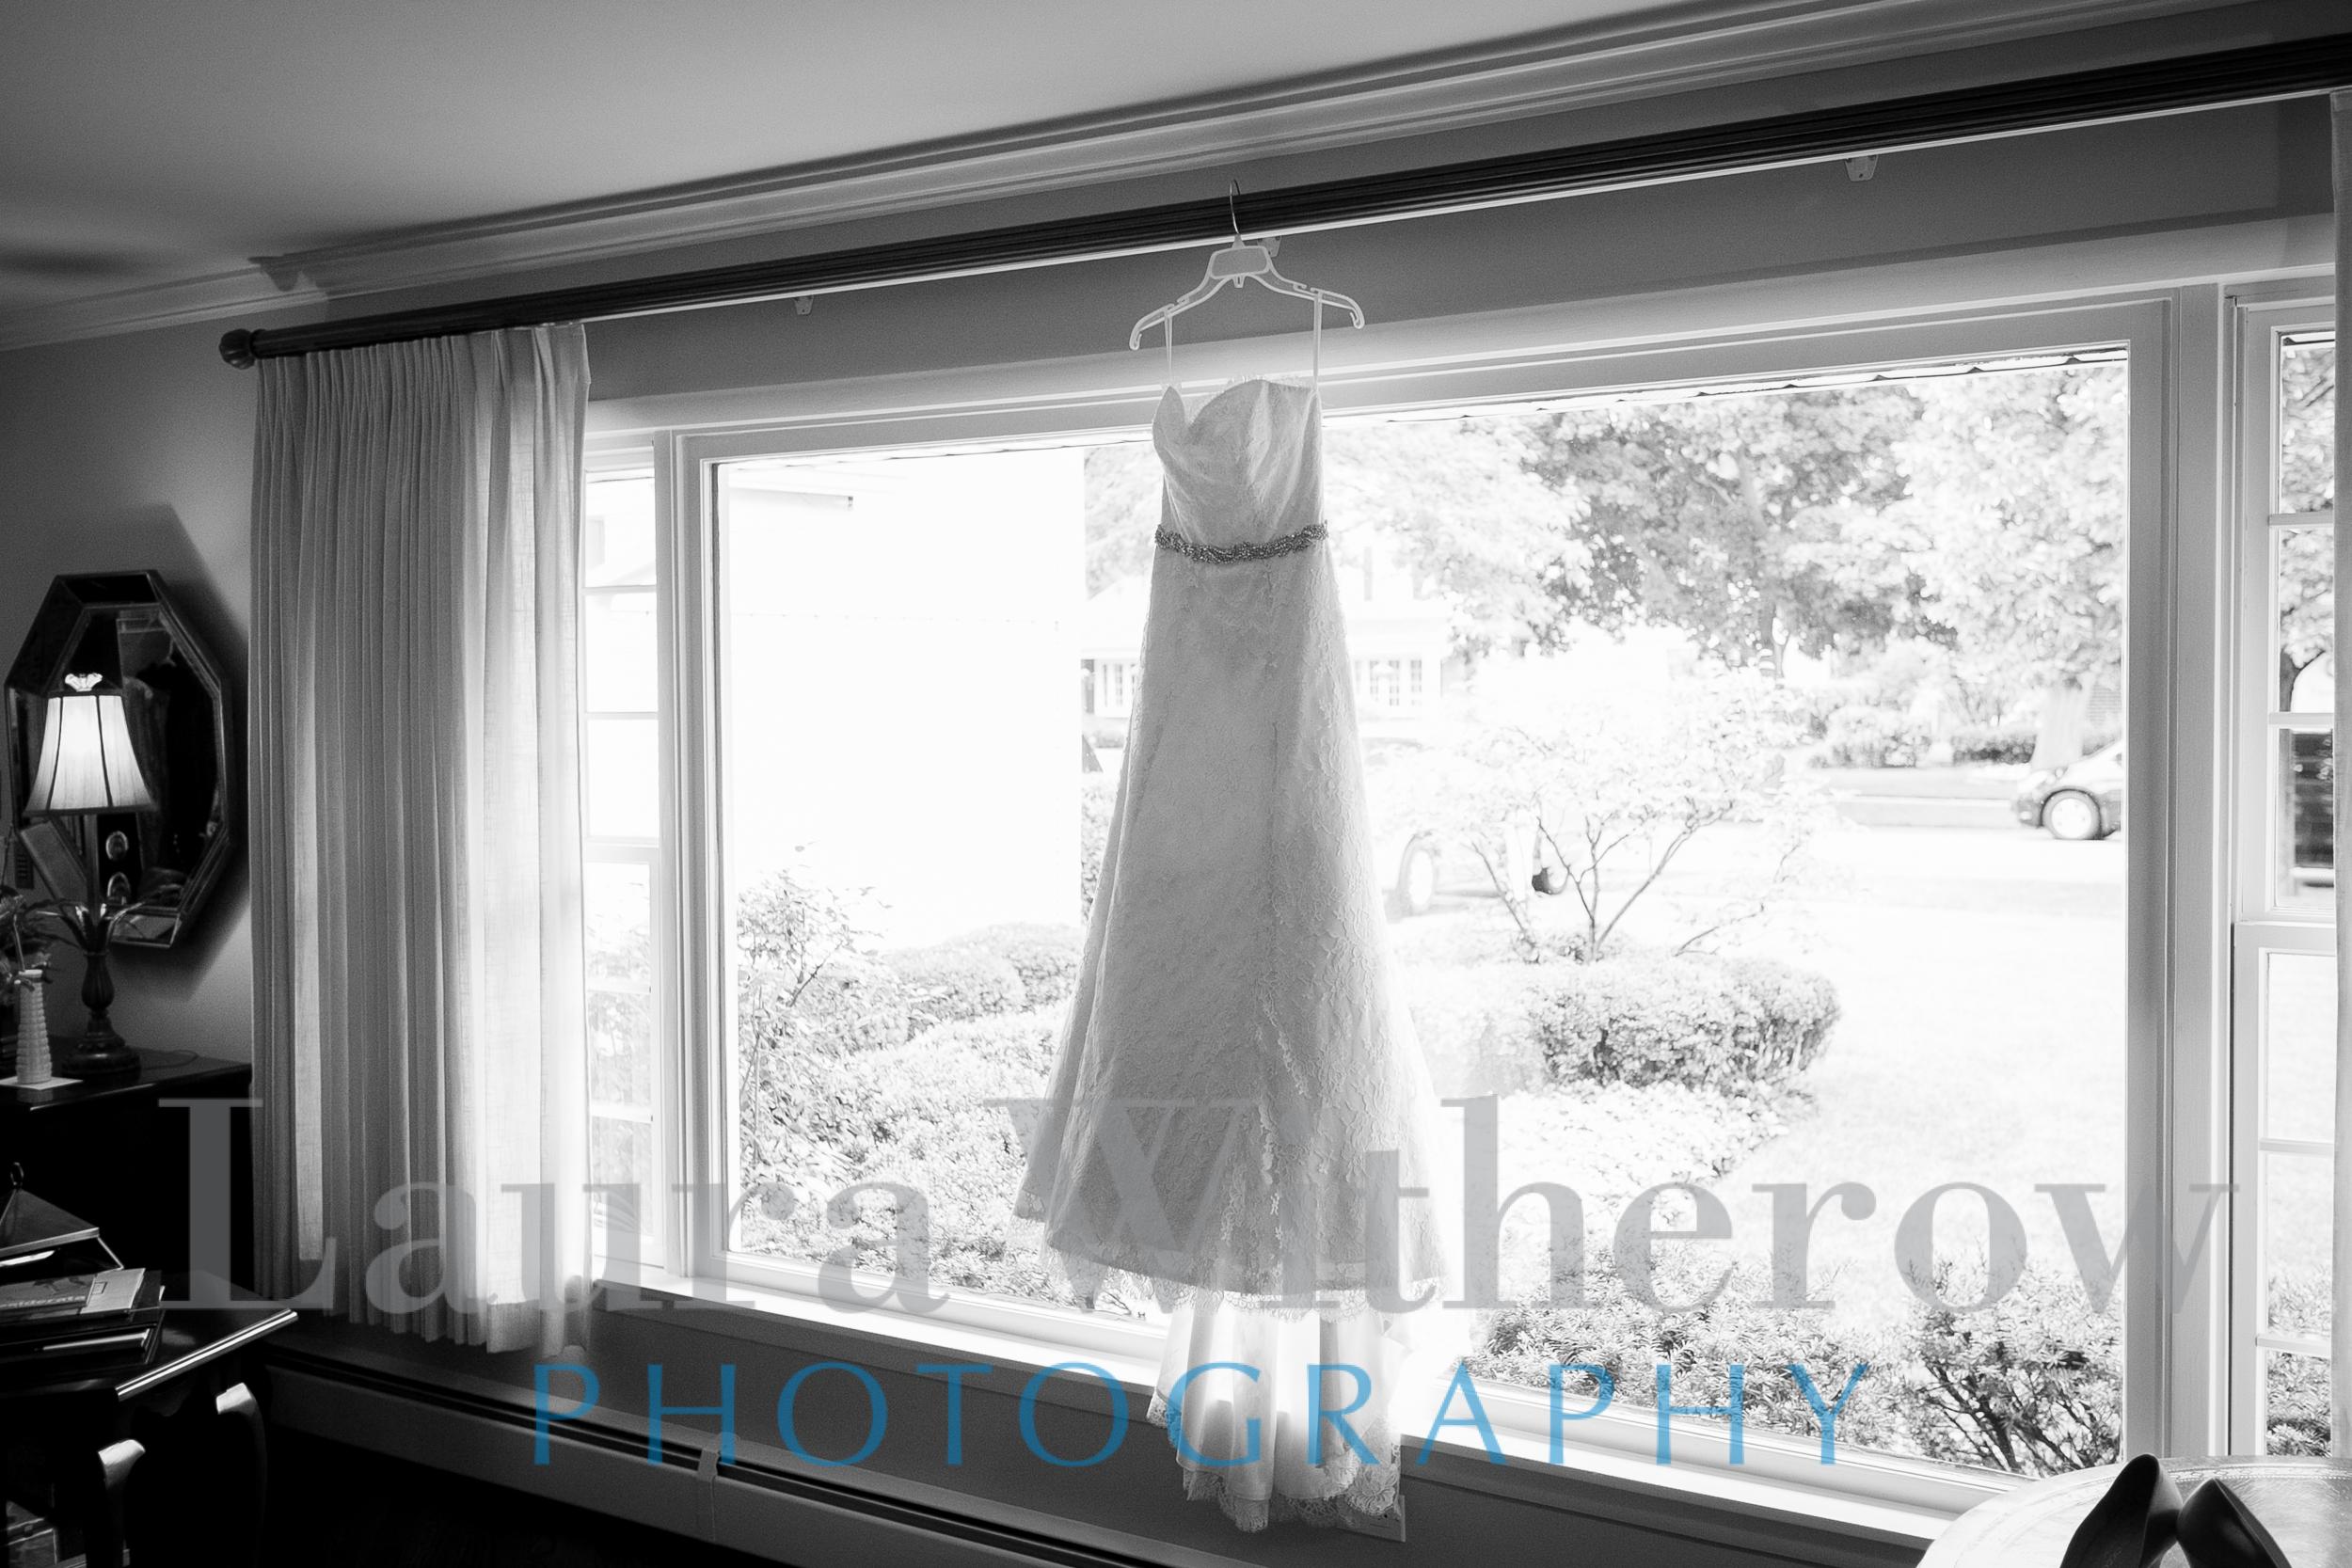 northshore-wedding-pictures.jpg